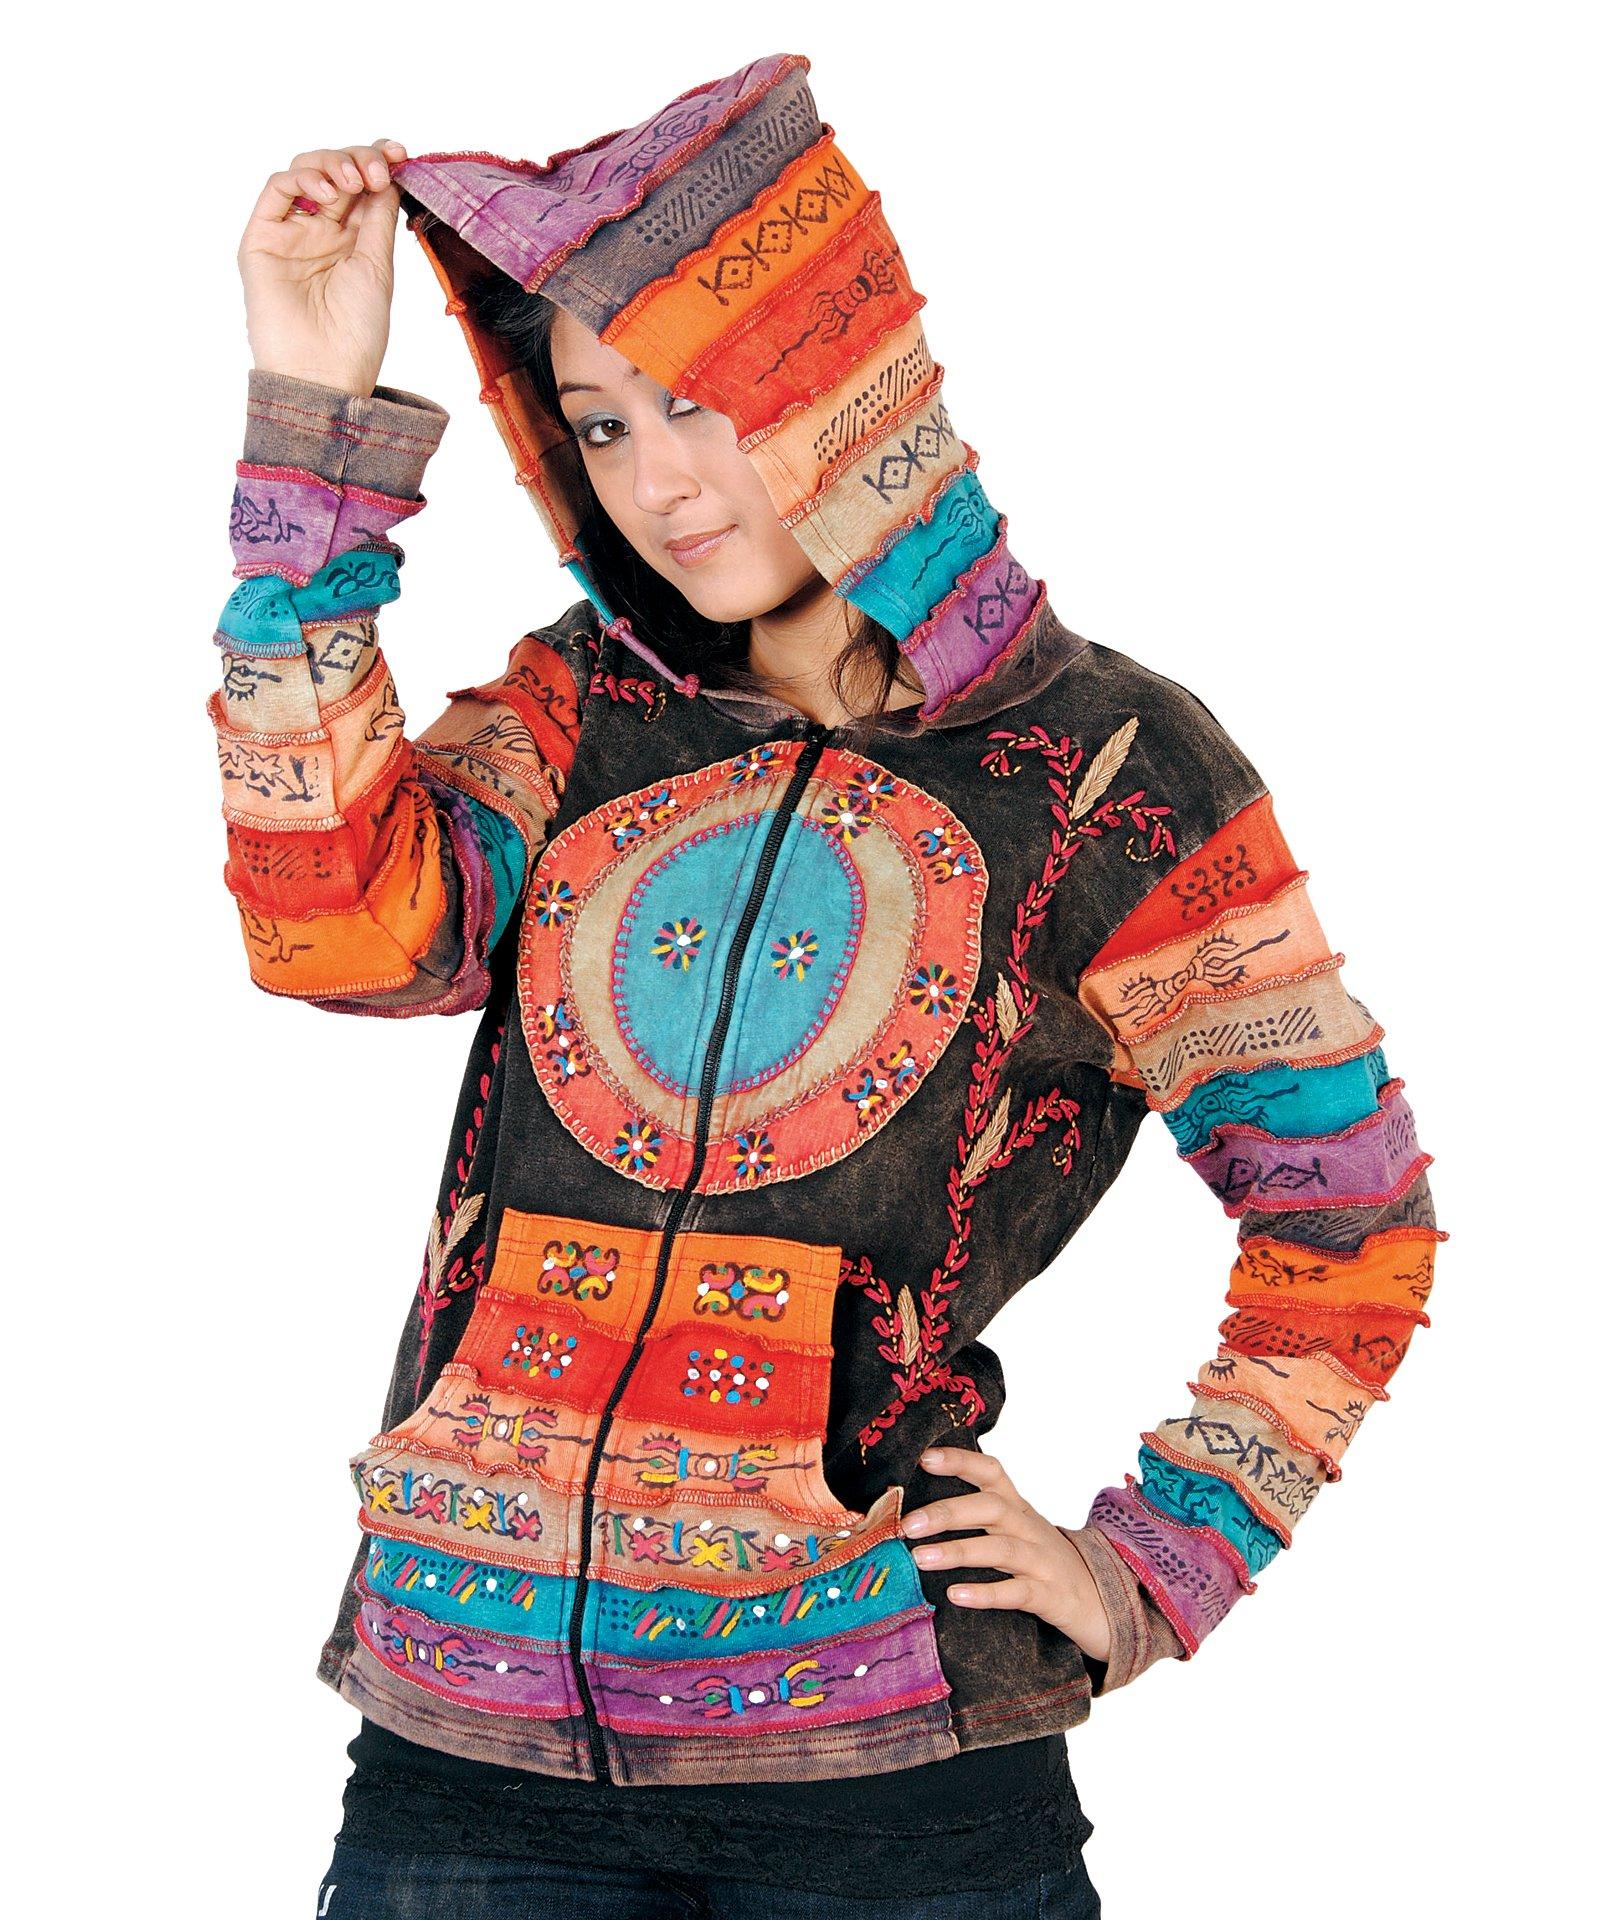 Rising International Inc Women's Stipes and Symbols Cotton Jacket XL